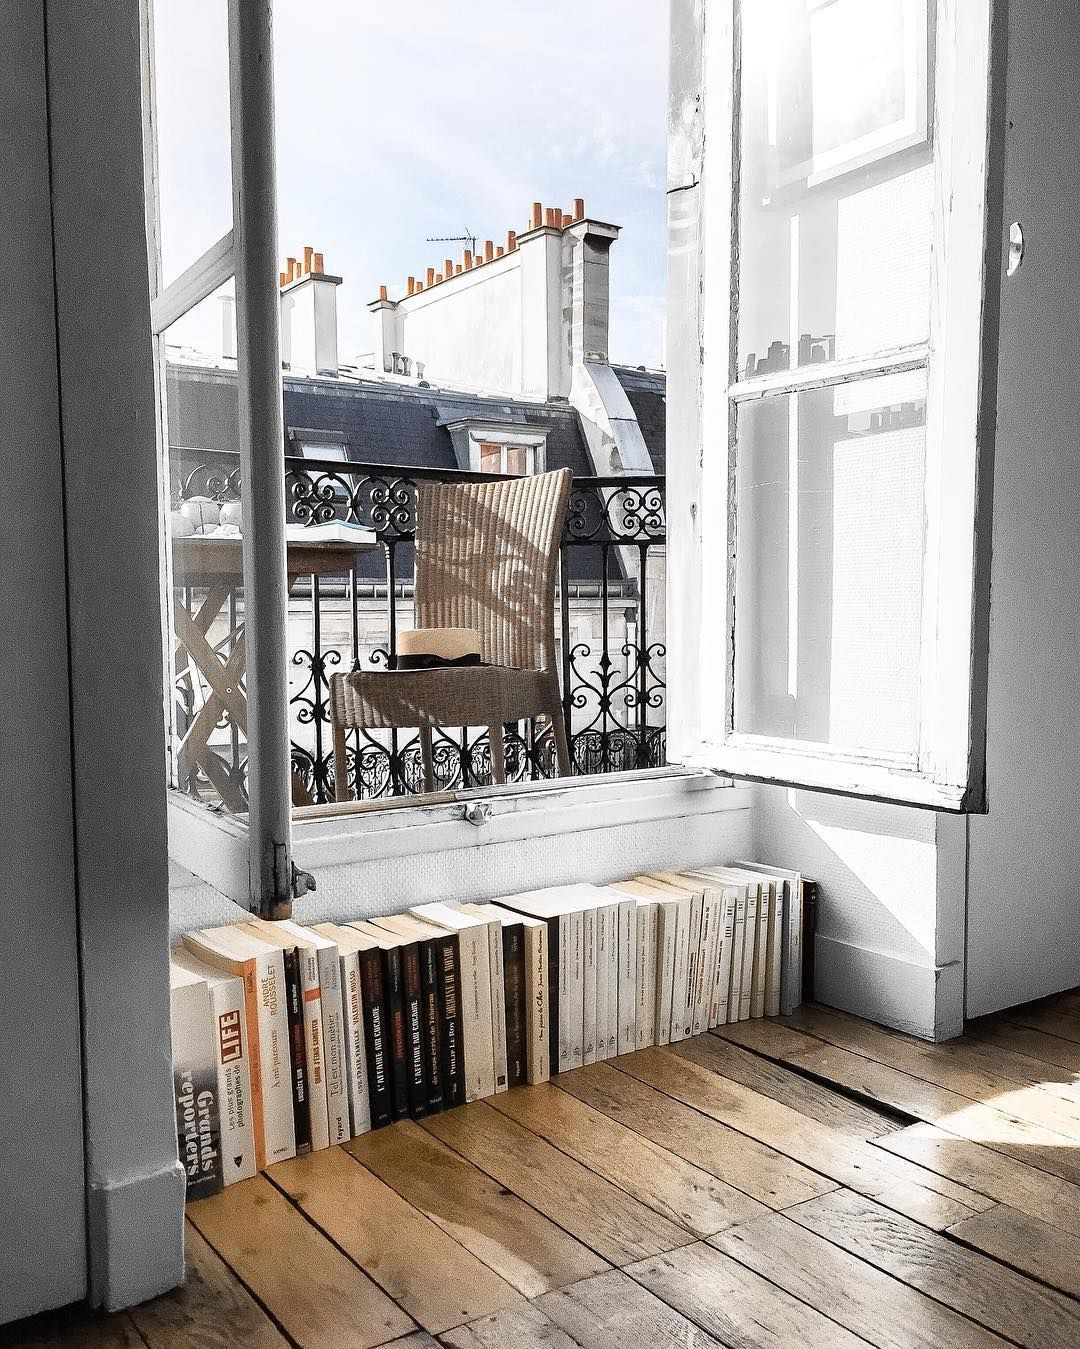 10 Creative Ways to Store Books (That Aren't Bookshelves)